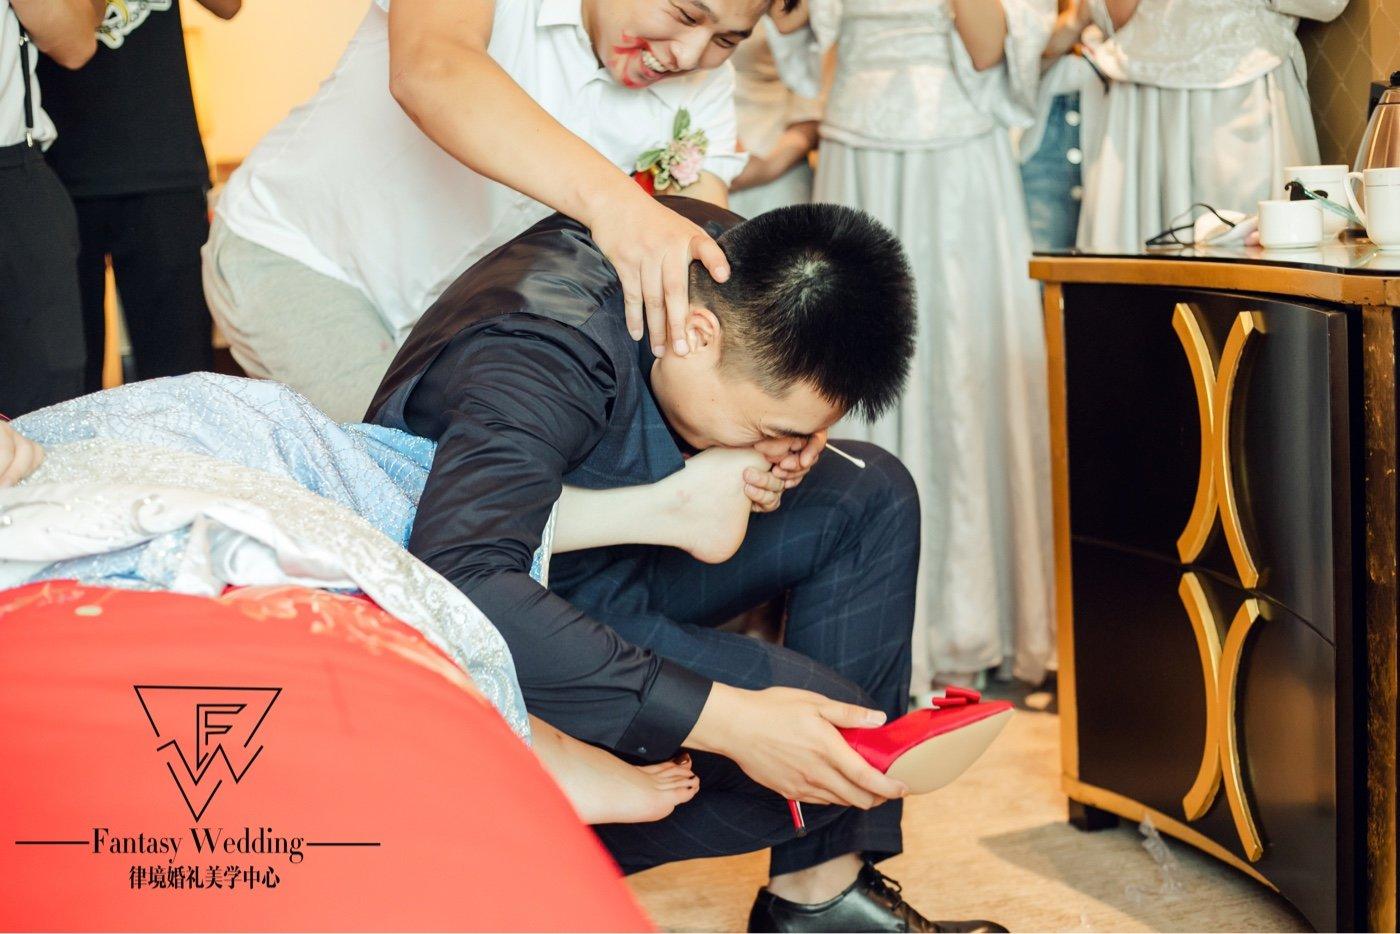 「Fantasy Wedding」&汉式婚礼5